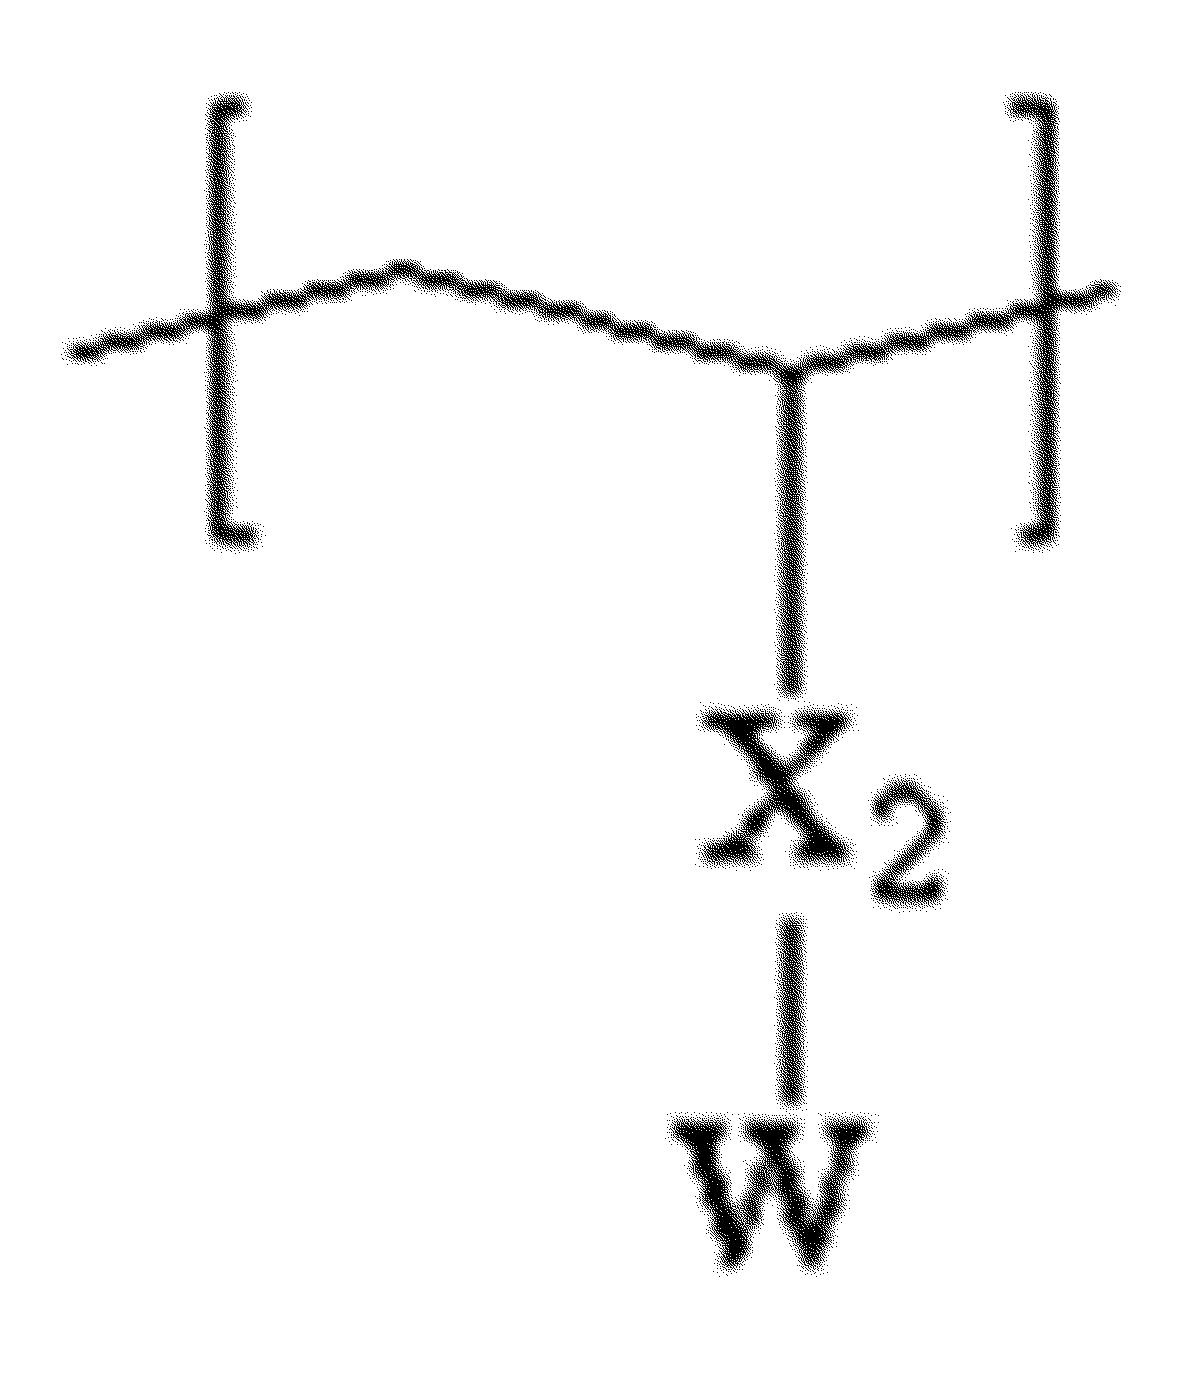 Figure PCTKR2015010327-appb-I000007